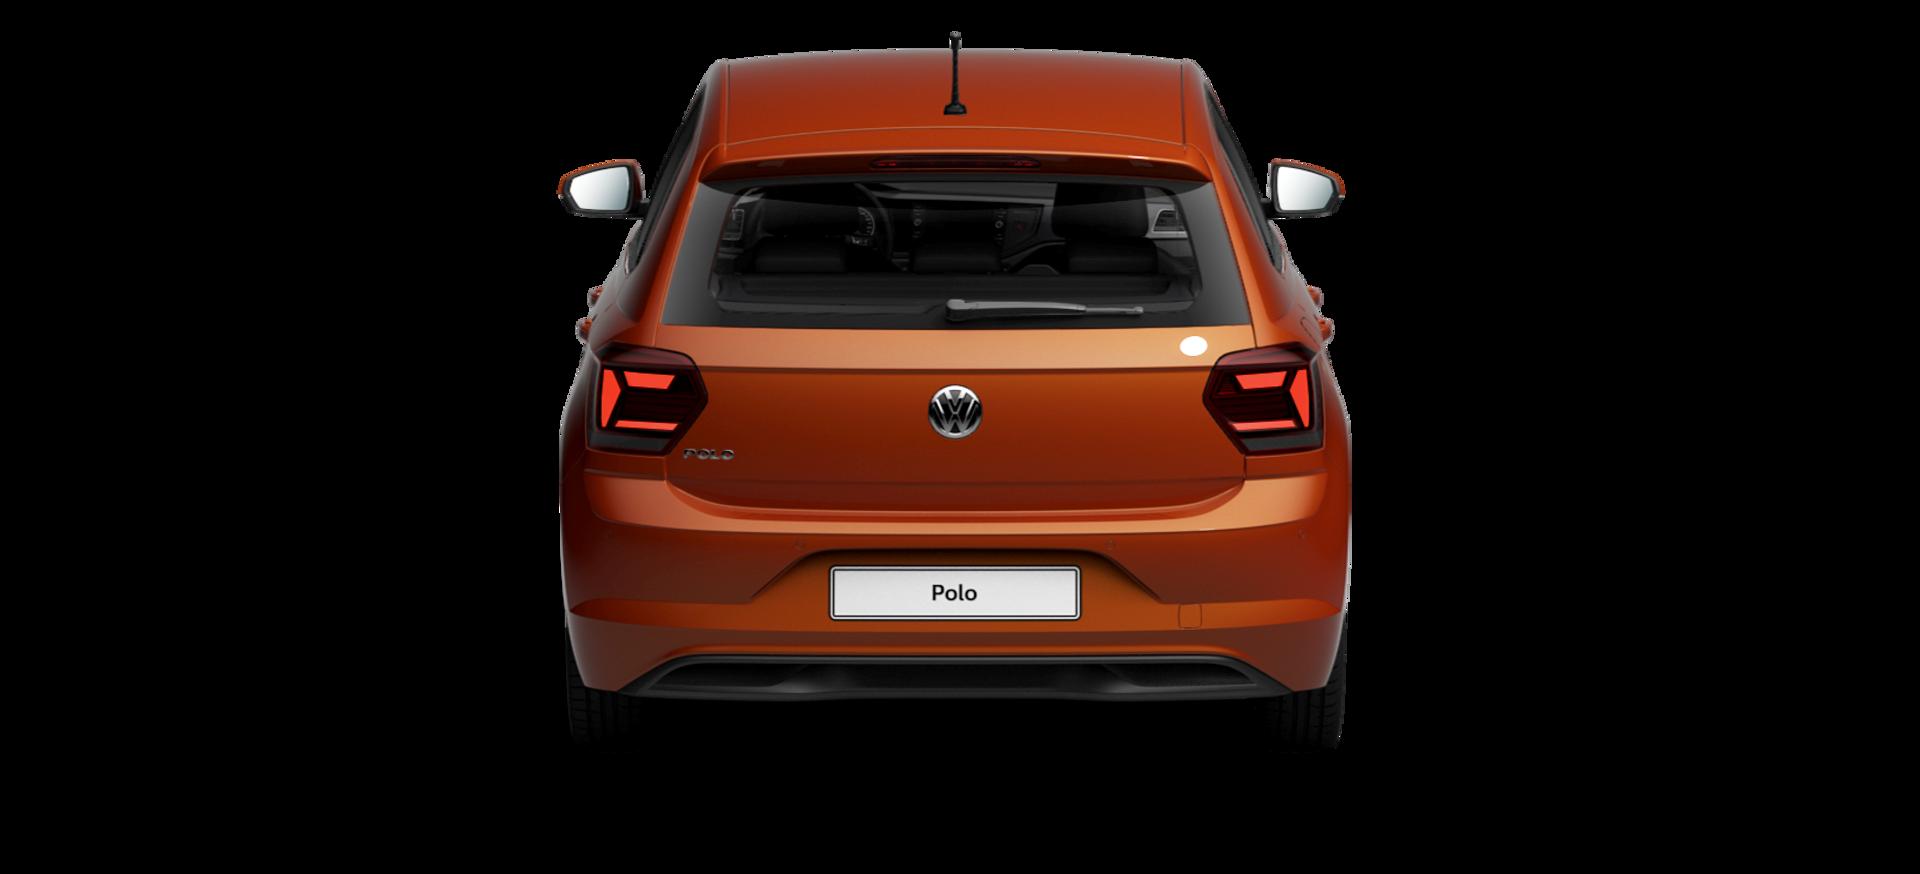 Polo Highline 1.0 TSI OPF 4 usi / 95 CP/70 kW / 1.0l / Manuala, 5 trepte / 4-usi : Volkswagen Polo